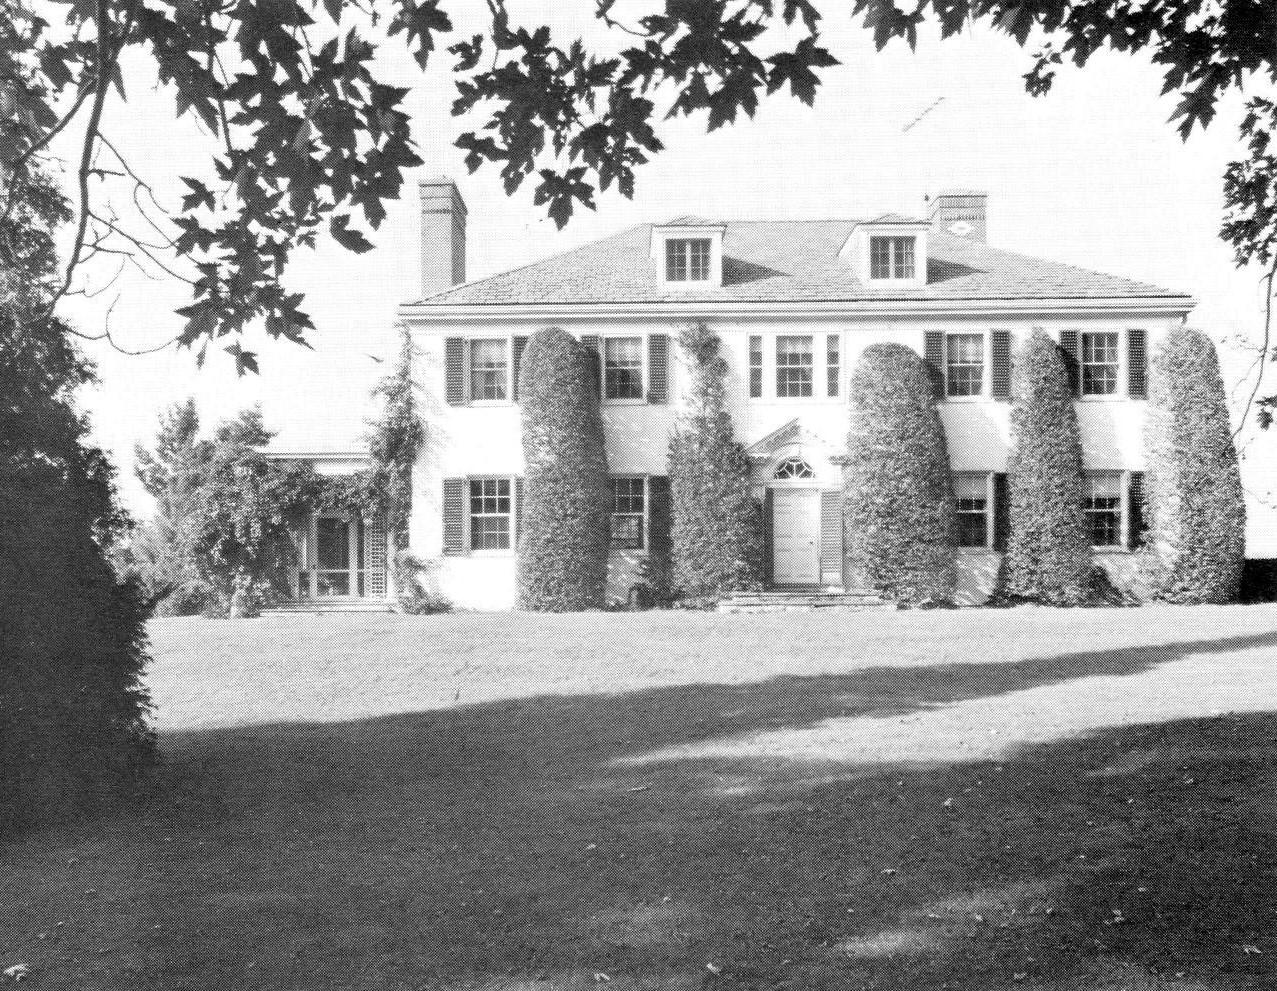 ca. 1927, after renovation